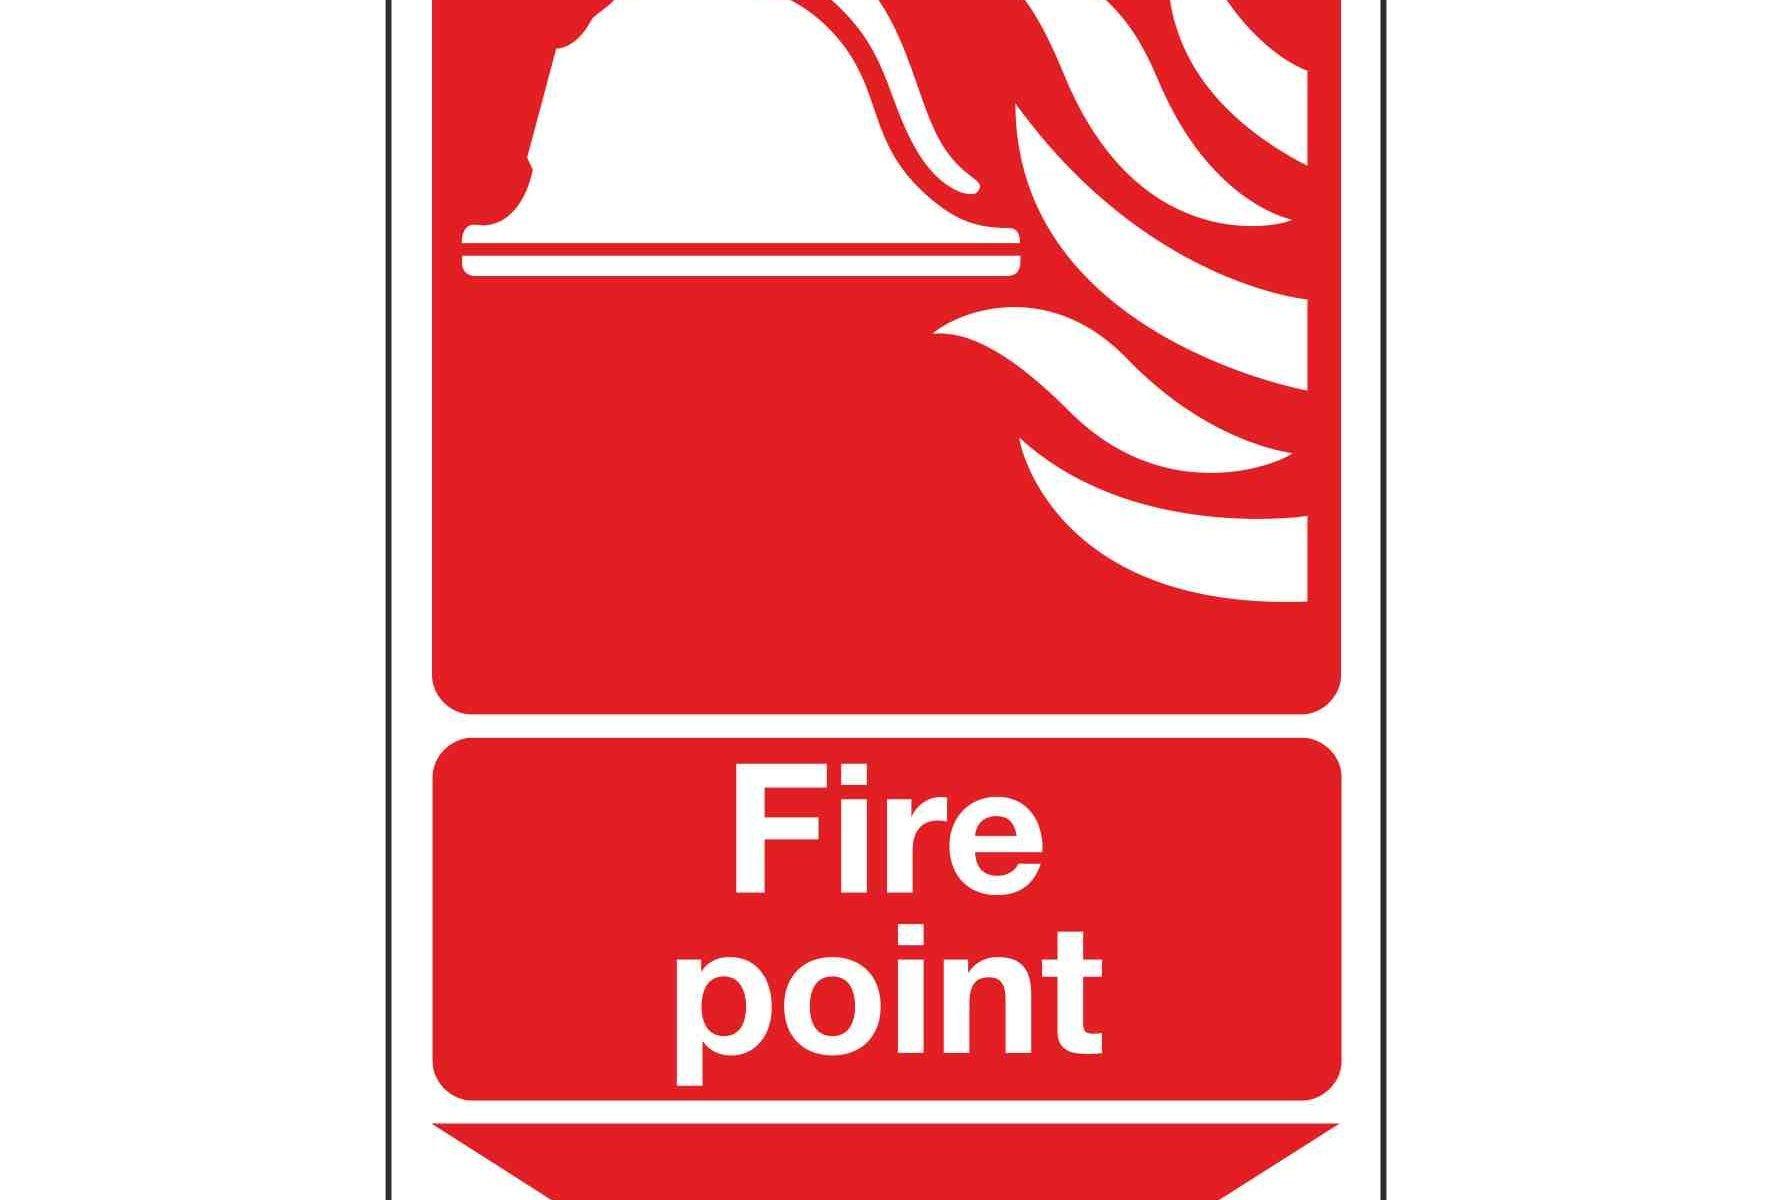 Fire point / Arrow Down